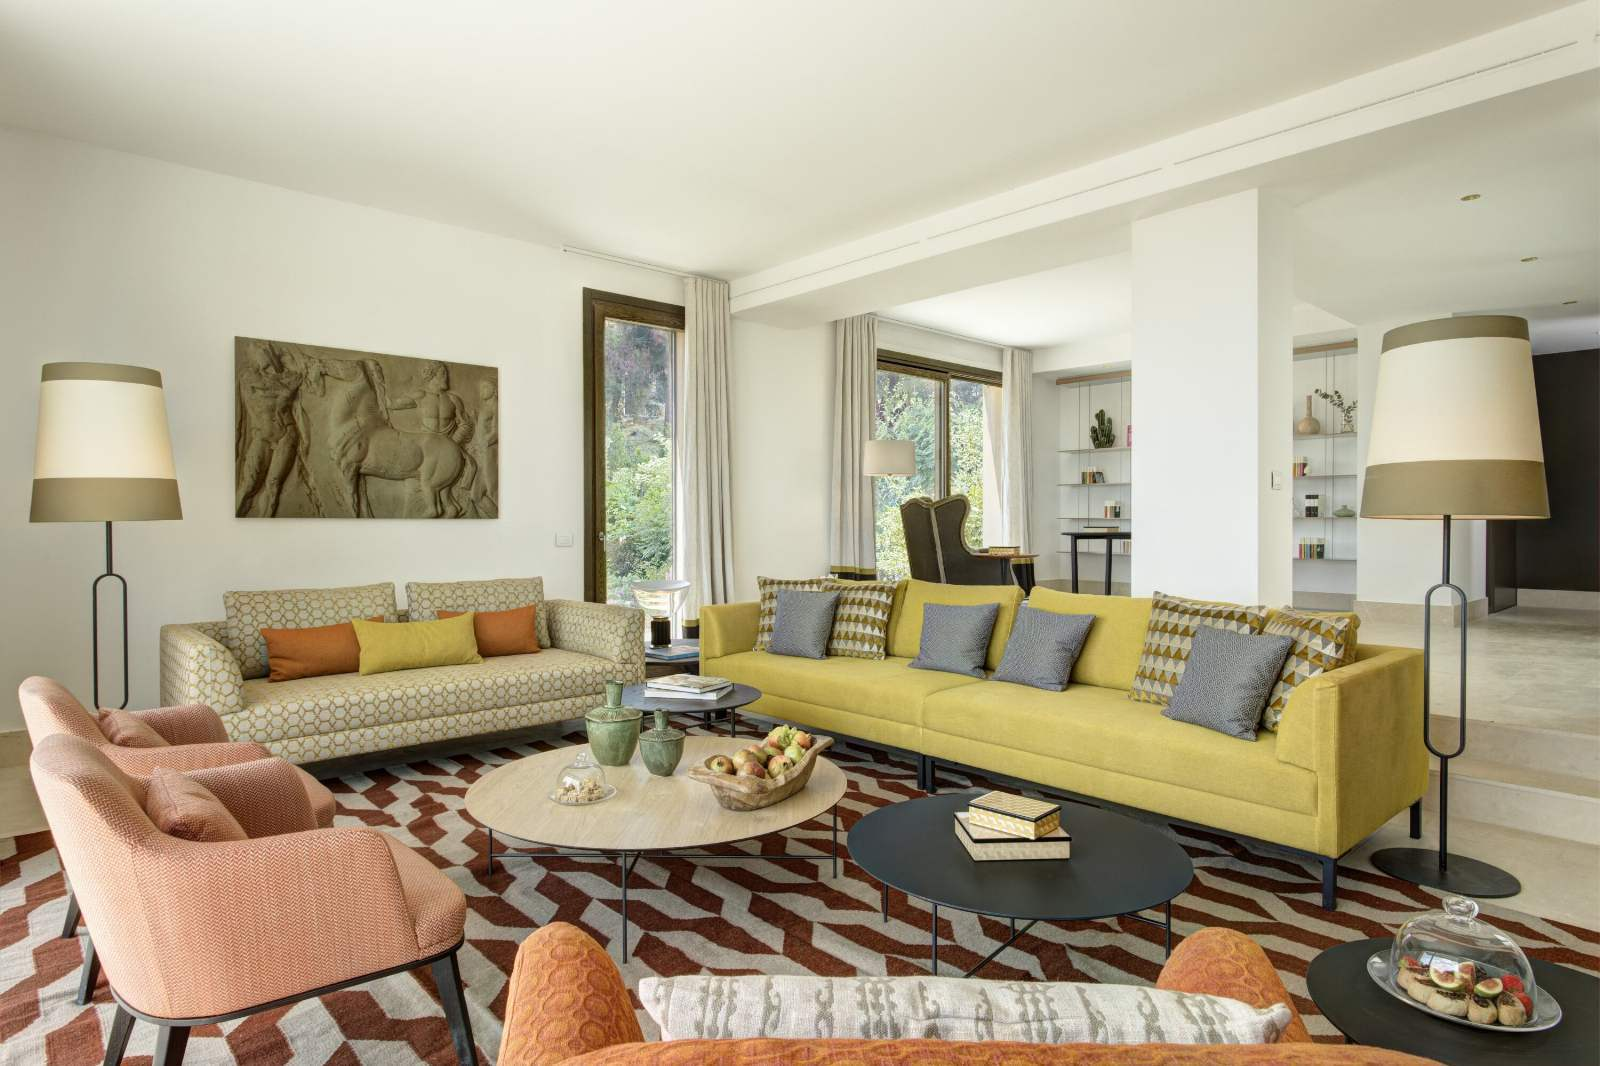 Verdura Resort: Private Villas: room / property / locale photo. Image 10